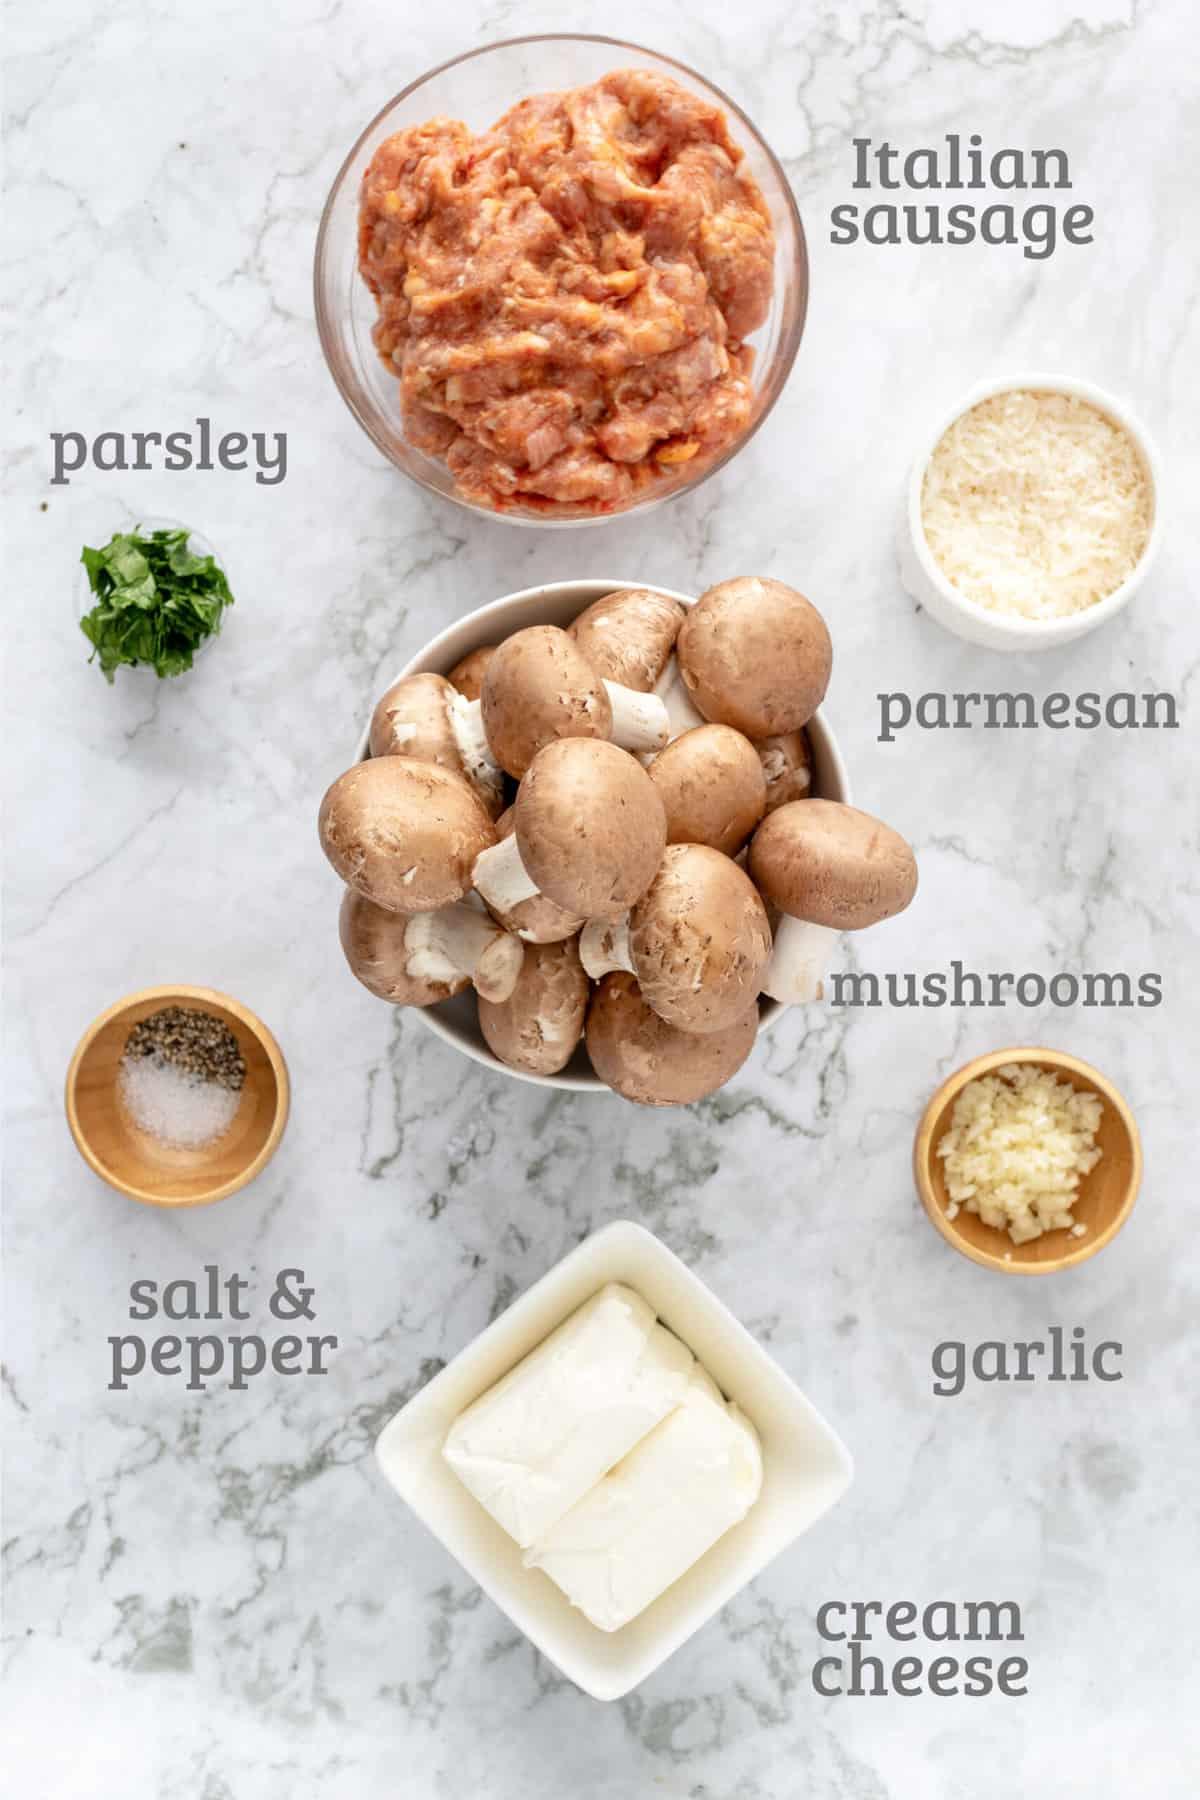 Ingredients for stuffed mushrooms - sausage, parmesan, garlic, mushrooms, cream cheese, salt, and pepper